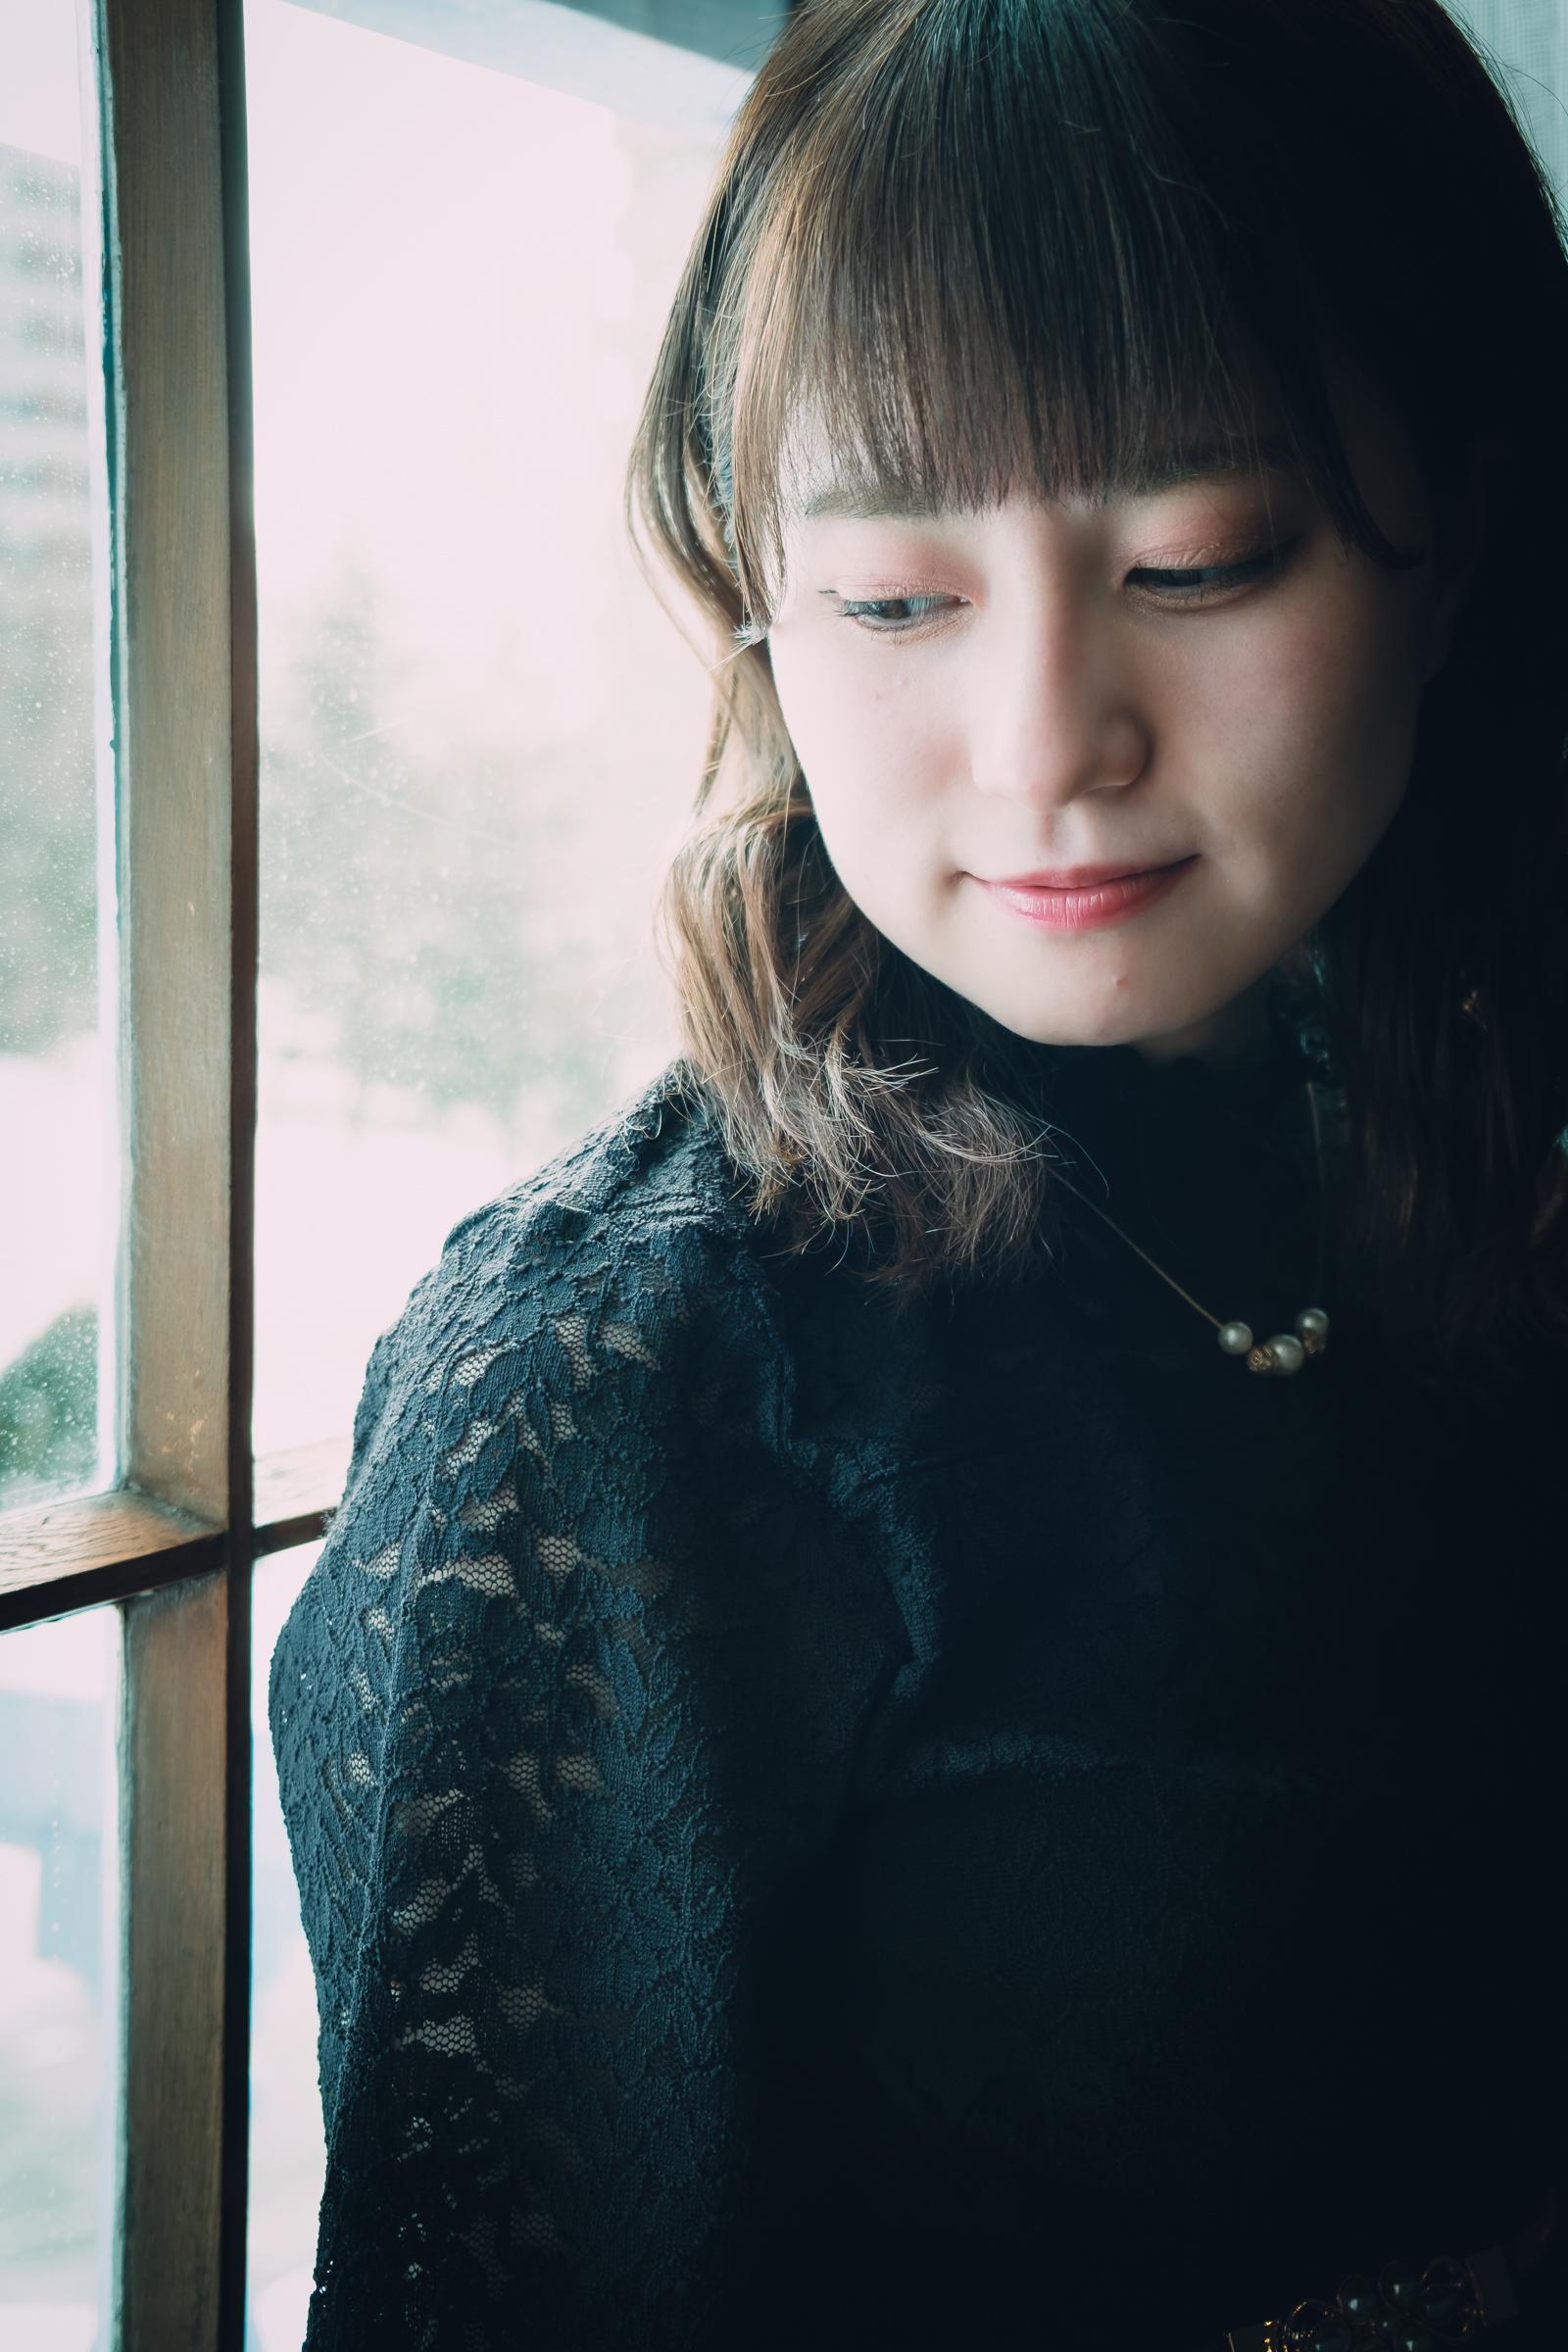 HAPPY少女♪ あゆみ ( 新谷亜由美 ) | SMP 札幌モデルプロ 撮影会 in 豊平館